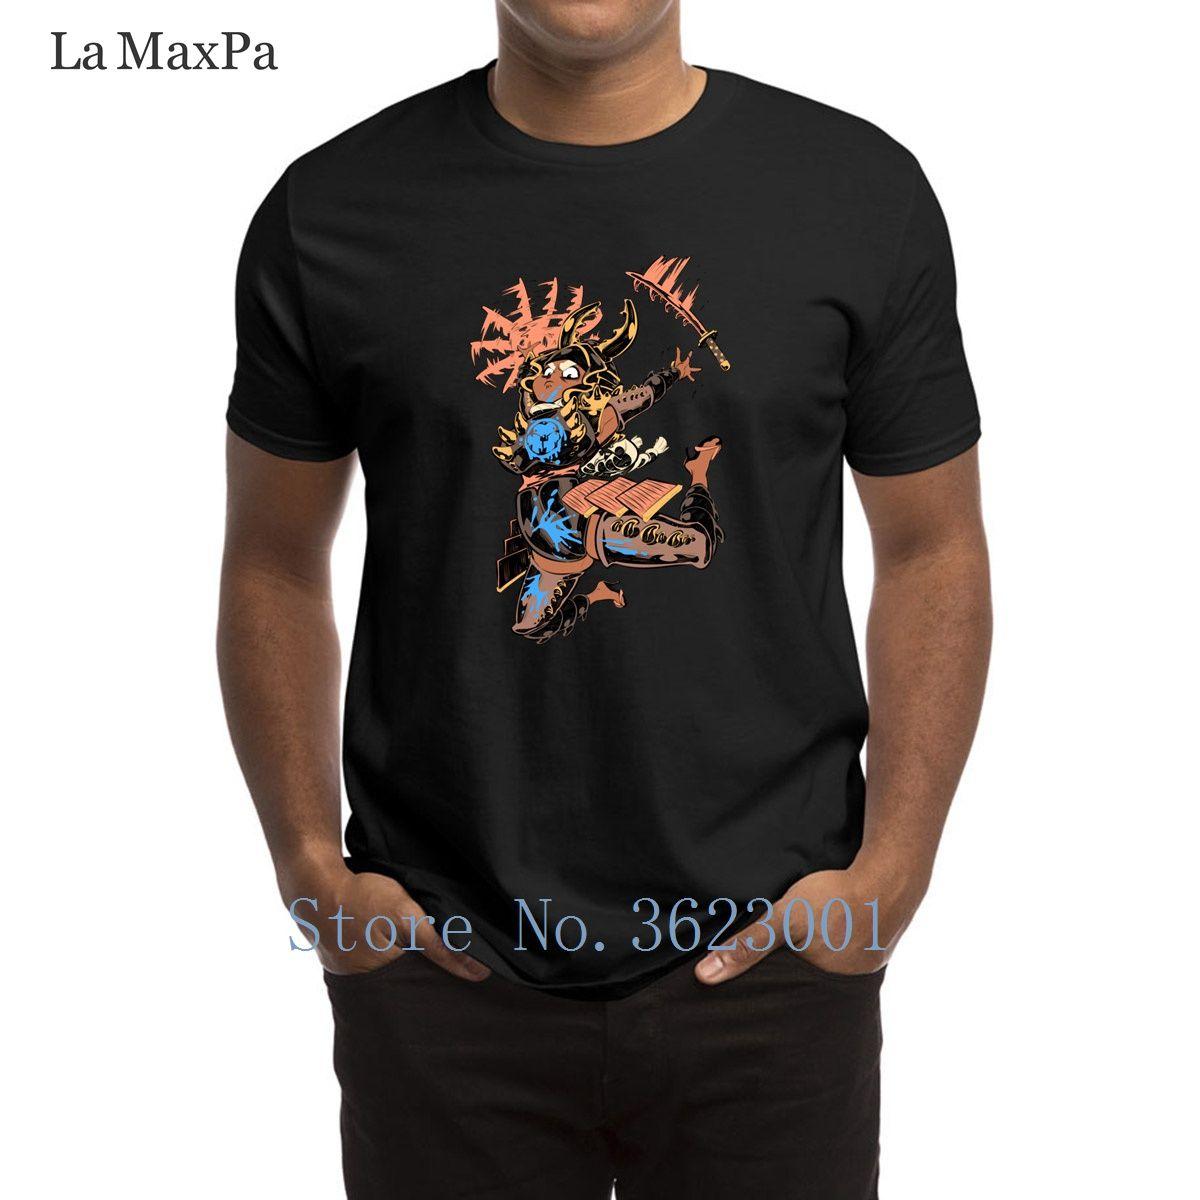 Designs Pictures T Shirt For Men Beetle Girl Men's T-Shirt Slim Fit Sunlight Tshirt New 100% Cotton Tee Shirt For Men Famous